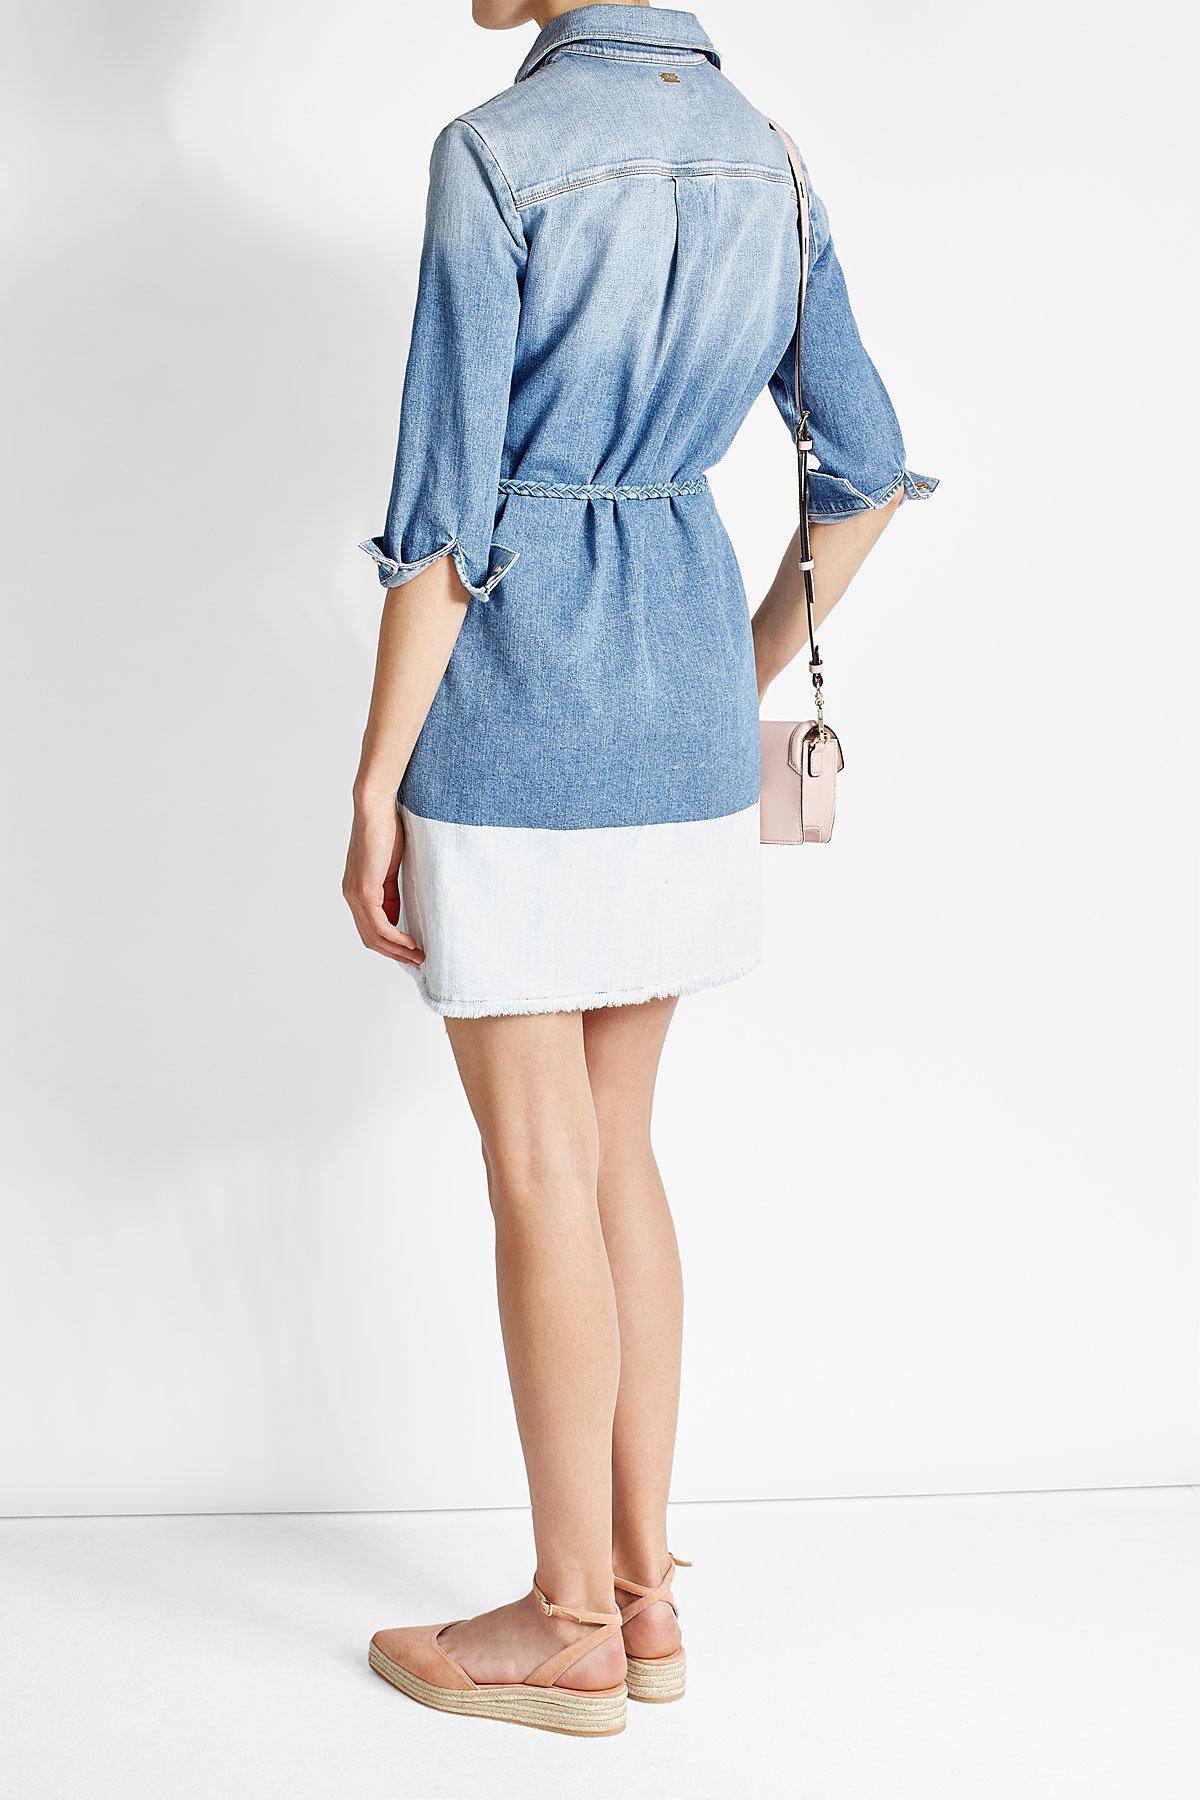 lyst 7 for all mankind denim shirt dress in blue